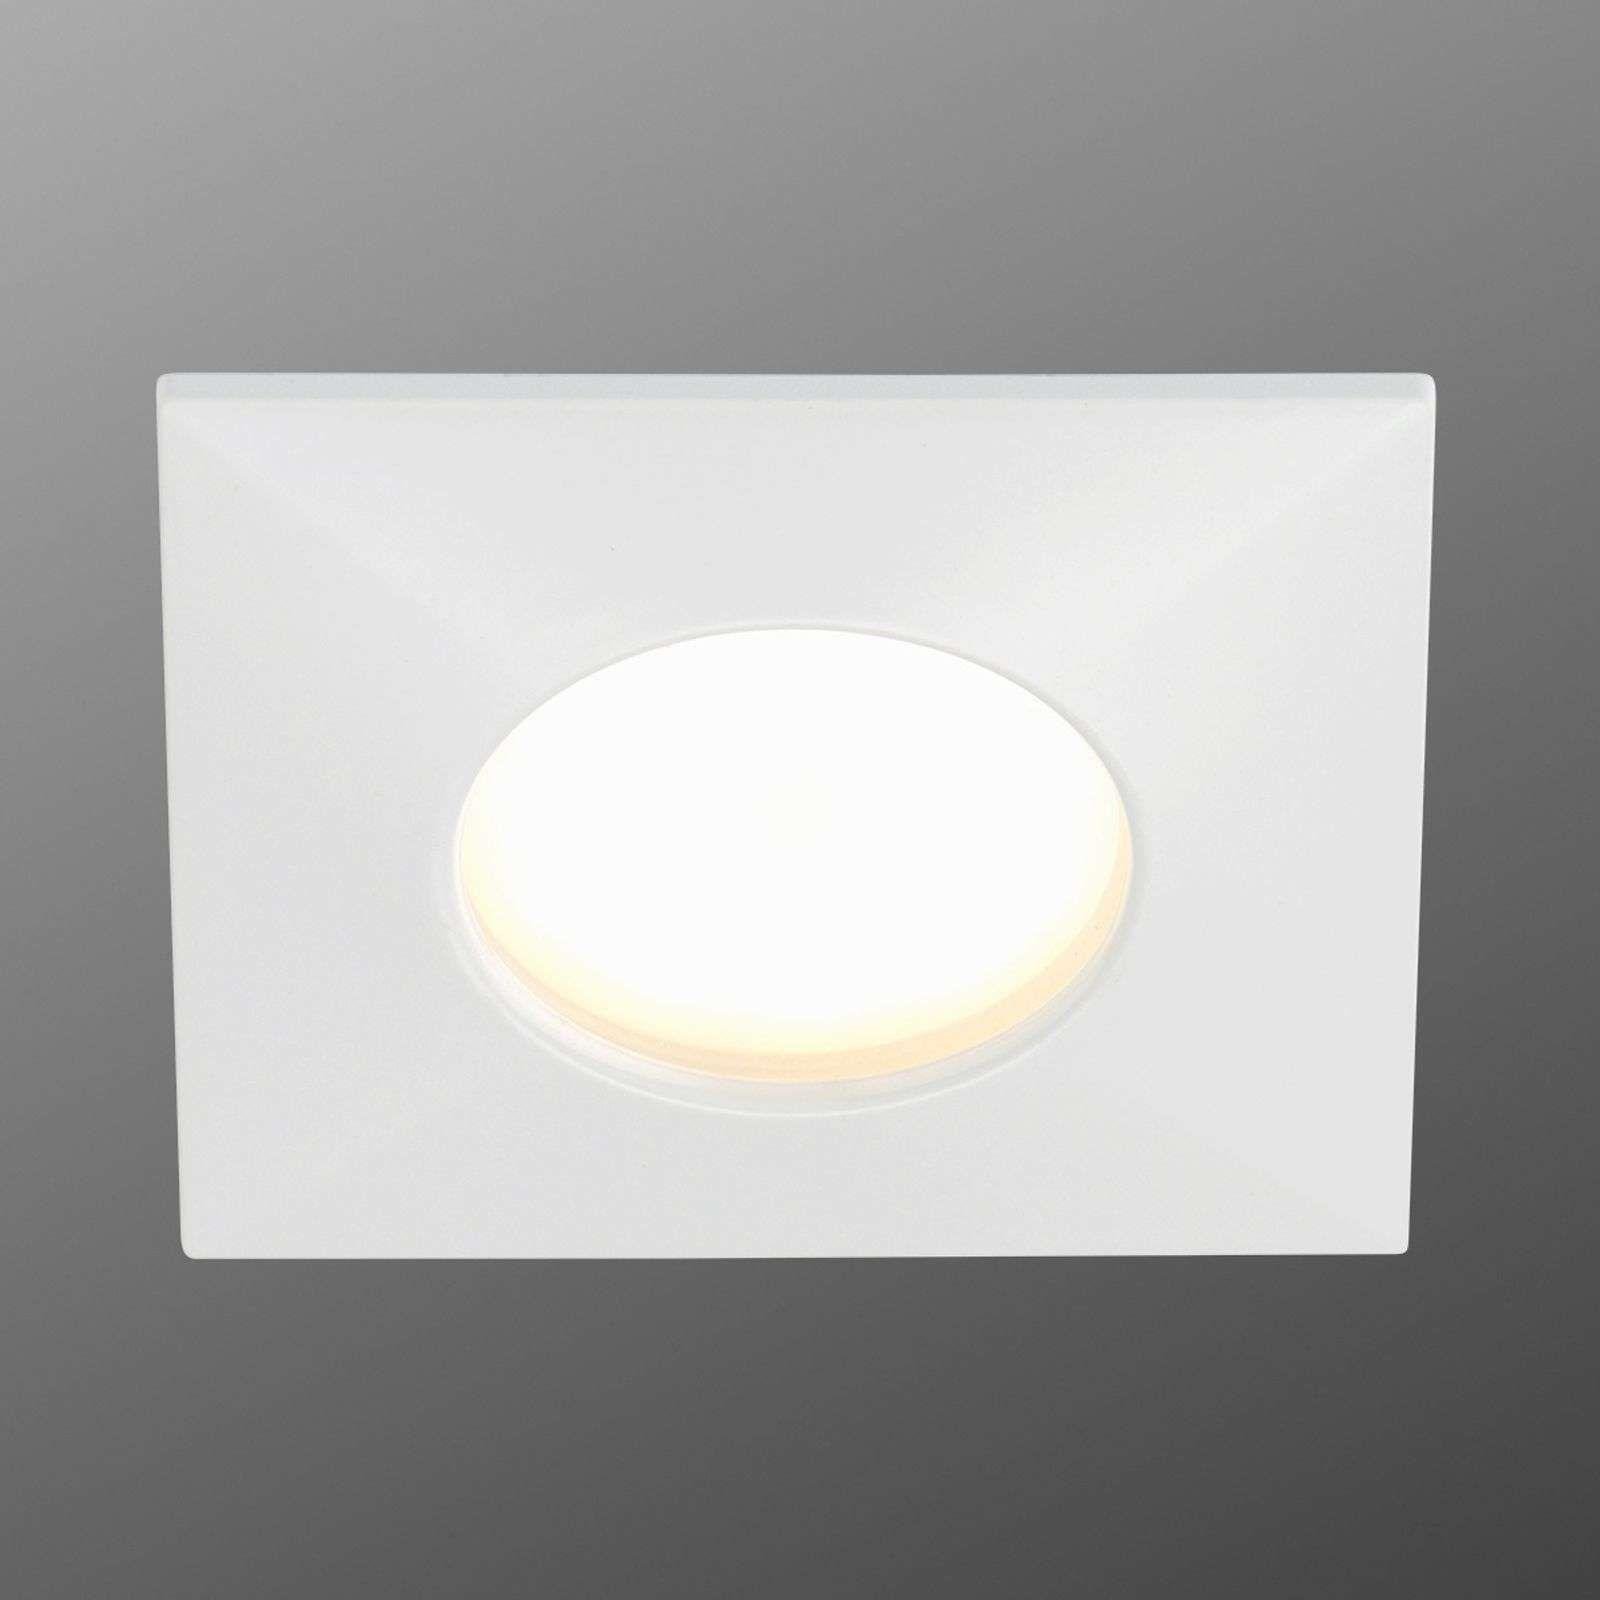 Luca Led Einbaustrahler Ip44 Weiss Luminaire Plafond Led Luminaire